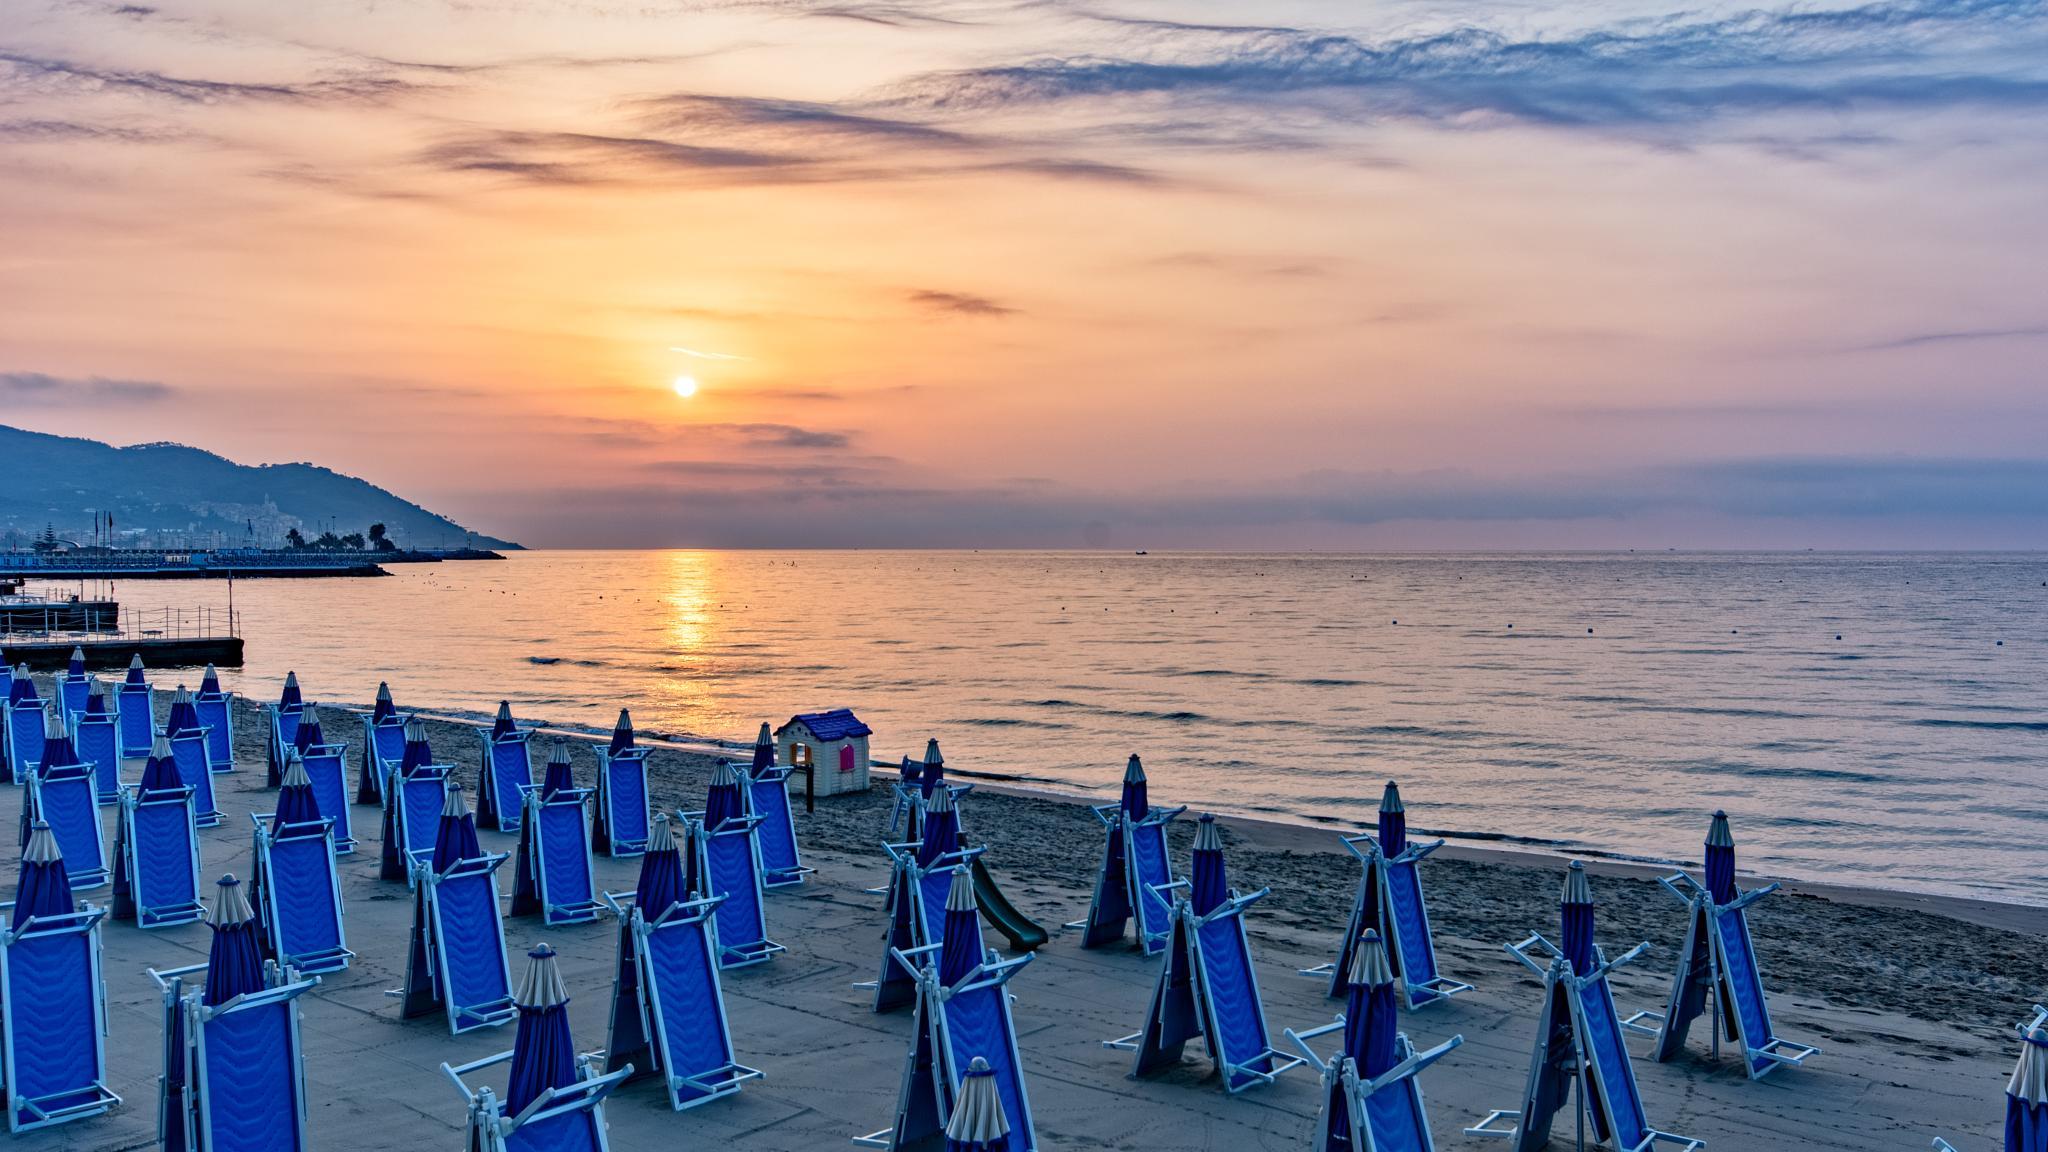 Sunrise on the beach by poggicarlo